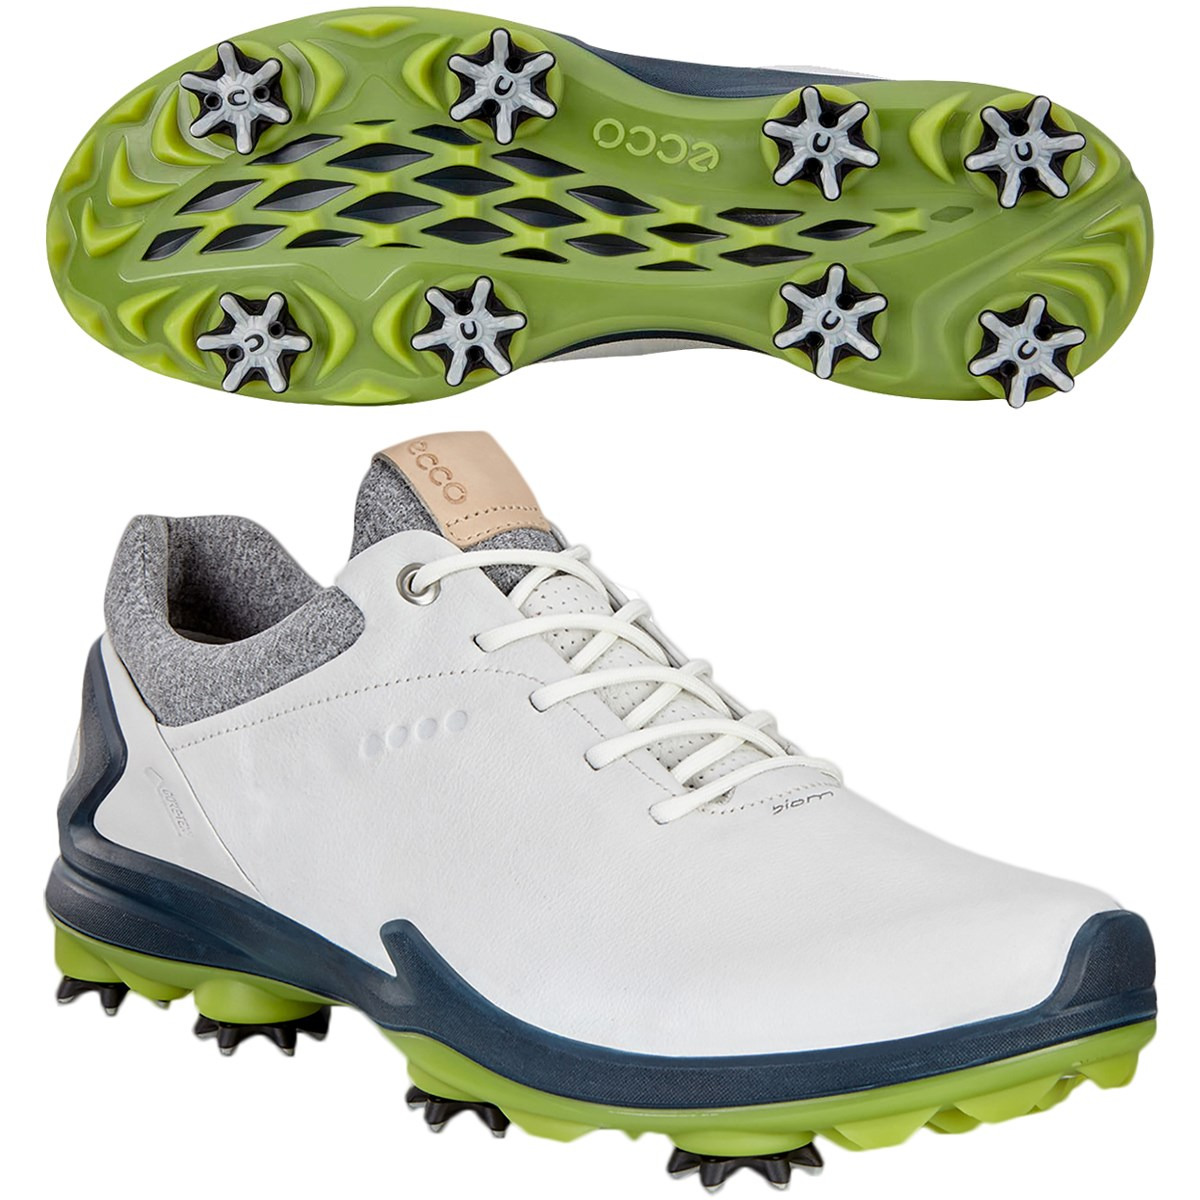 ecco エコー ゴルフ バイオム G3 GTX シューズ 25.5cm/EUサイズ40 ホワイト